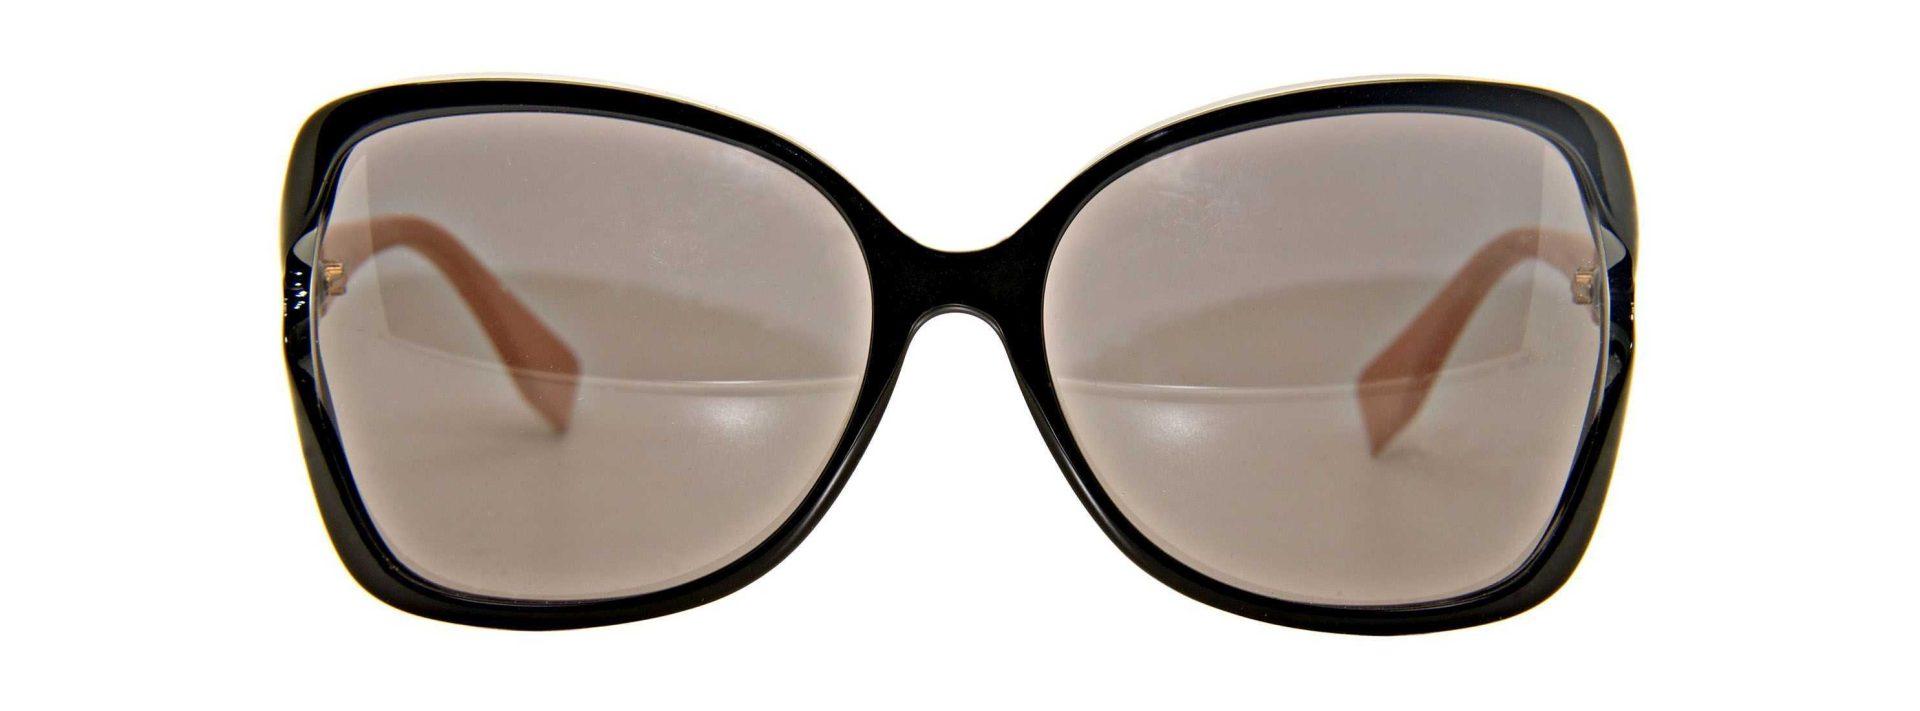 Fendi sunglasses 0148 Nj8y1 01 2970x1100